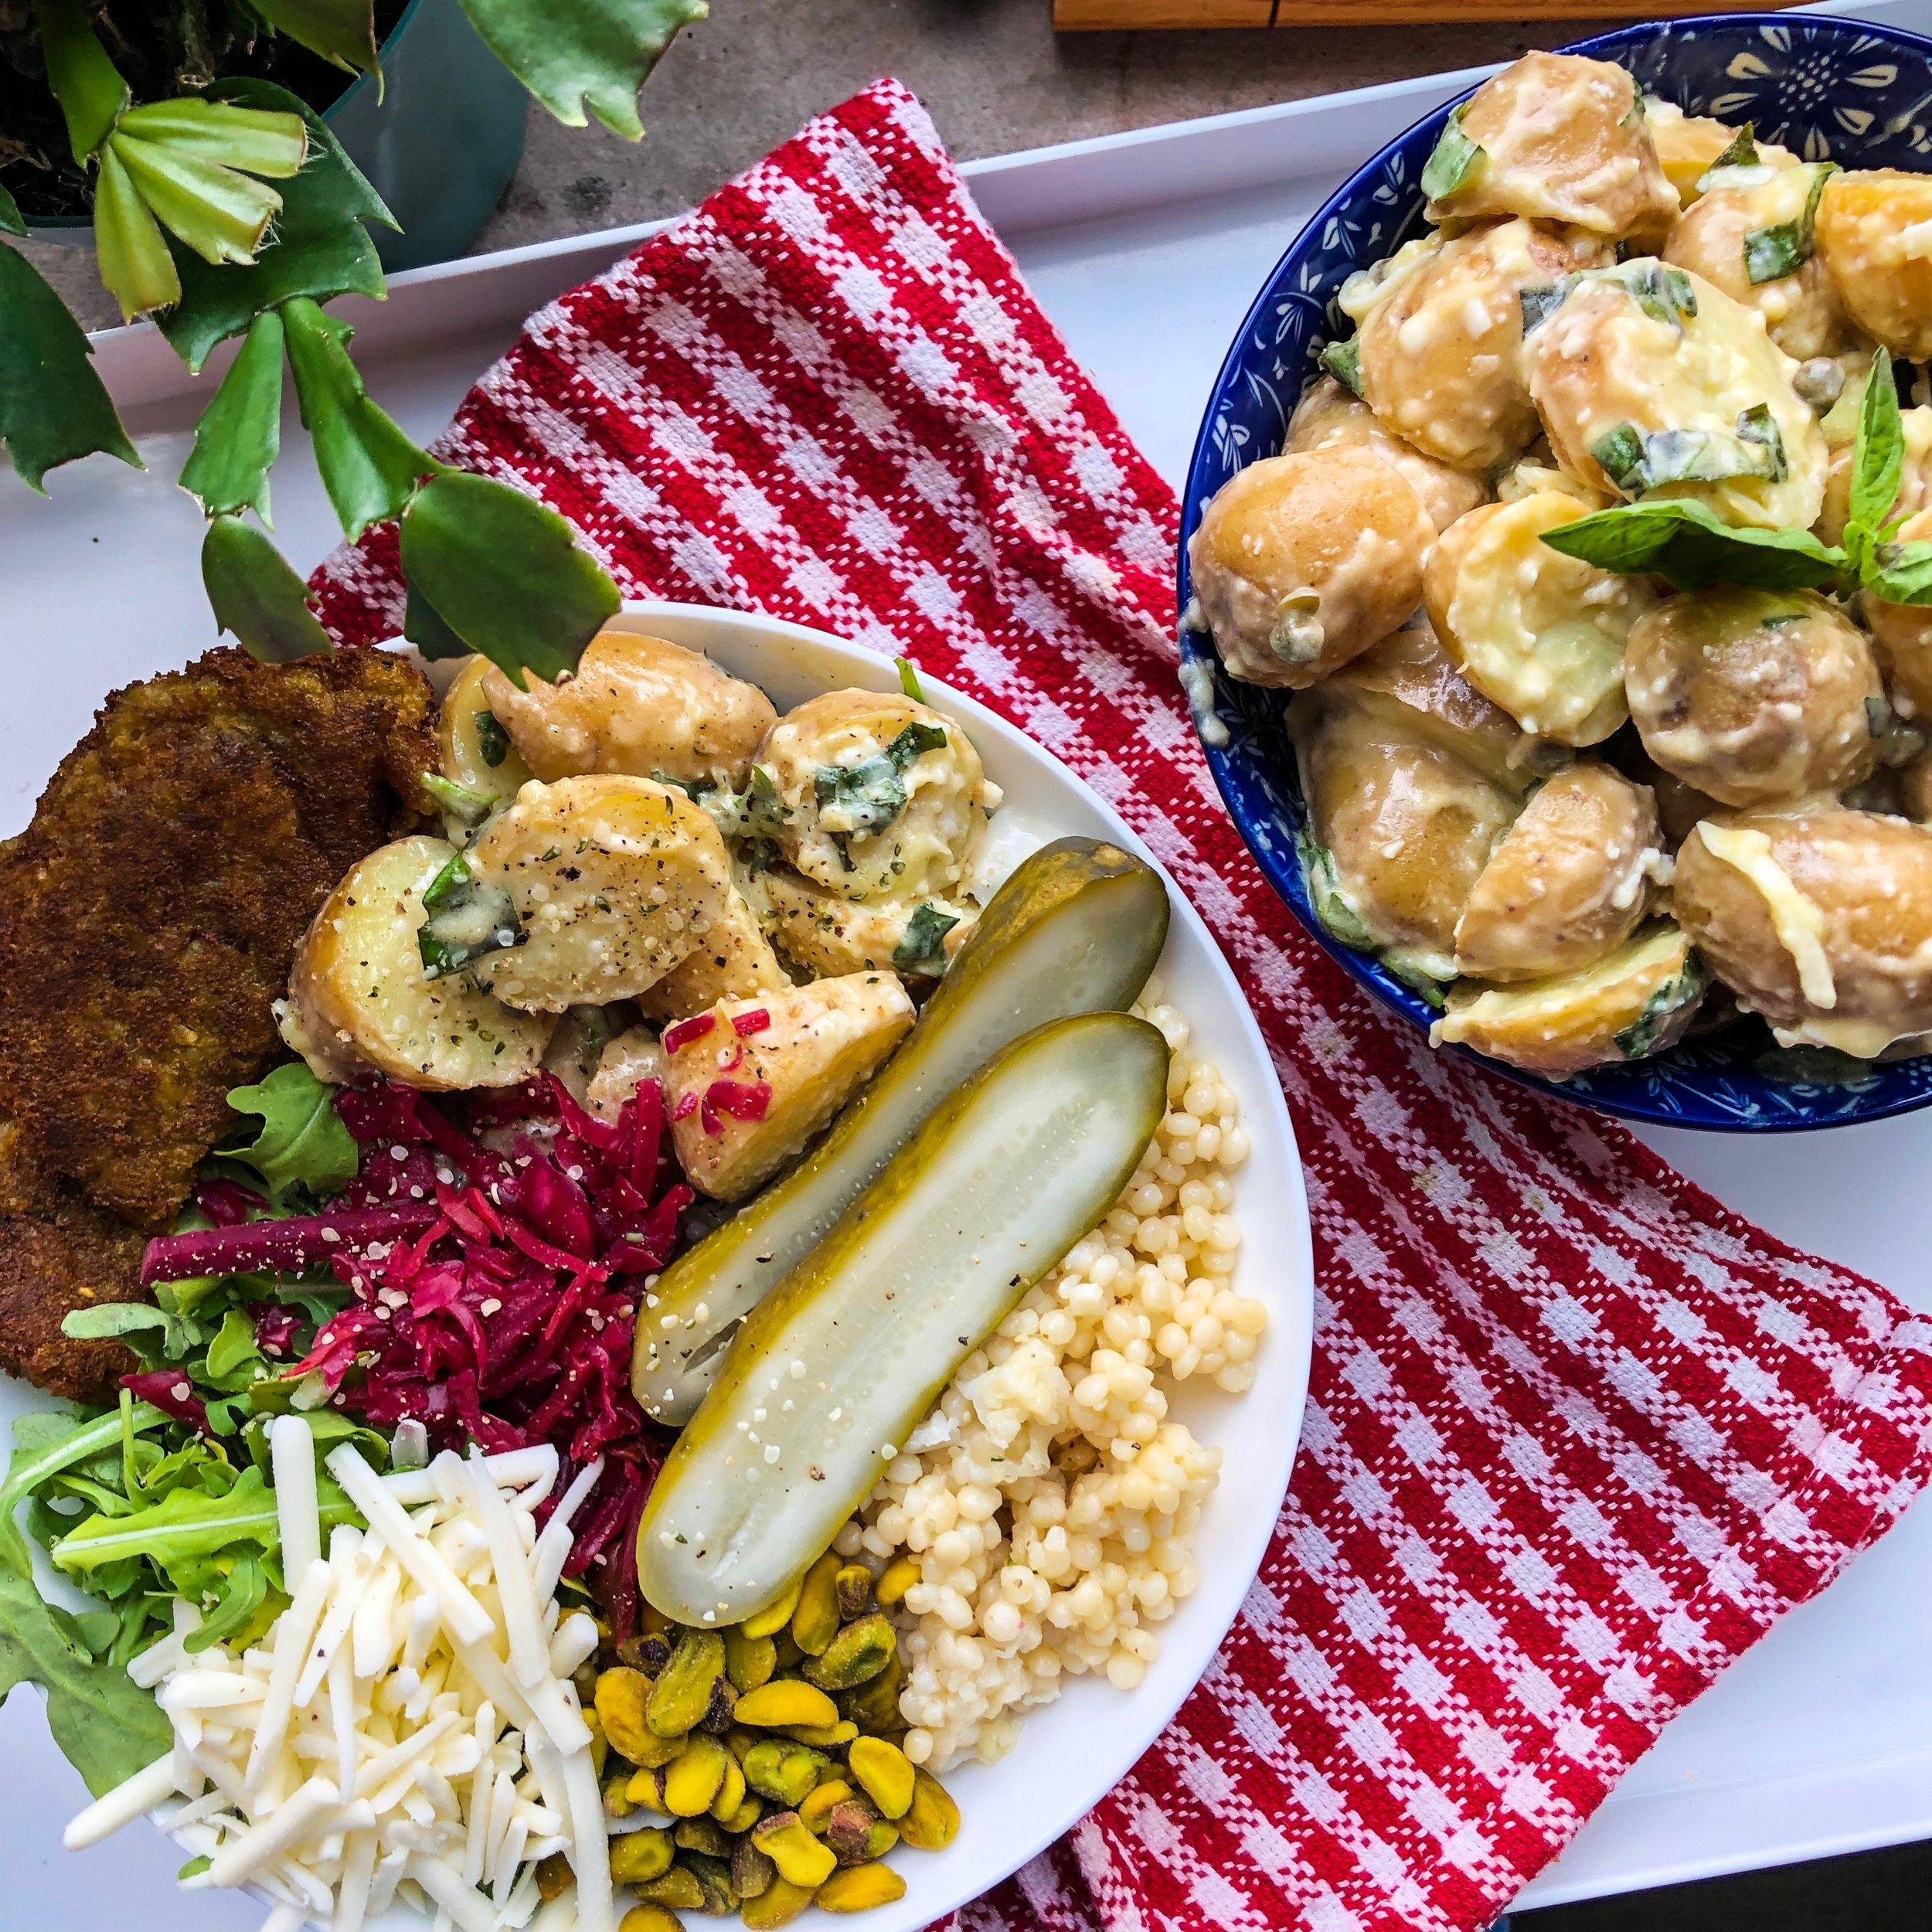 Vegan BasilPotato Salad - Vegan, Dairy-Free, Gluten-Free (optional)